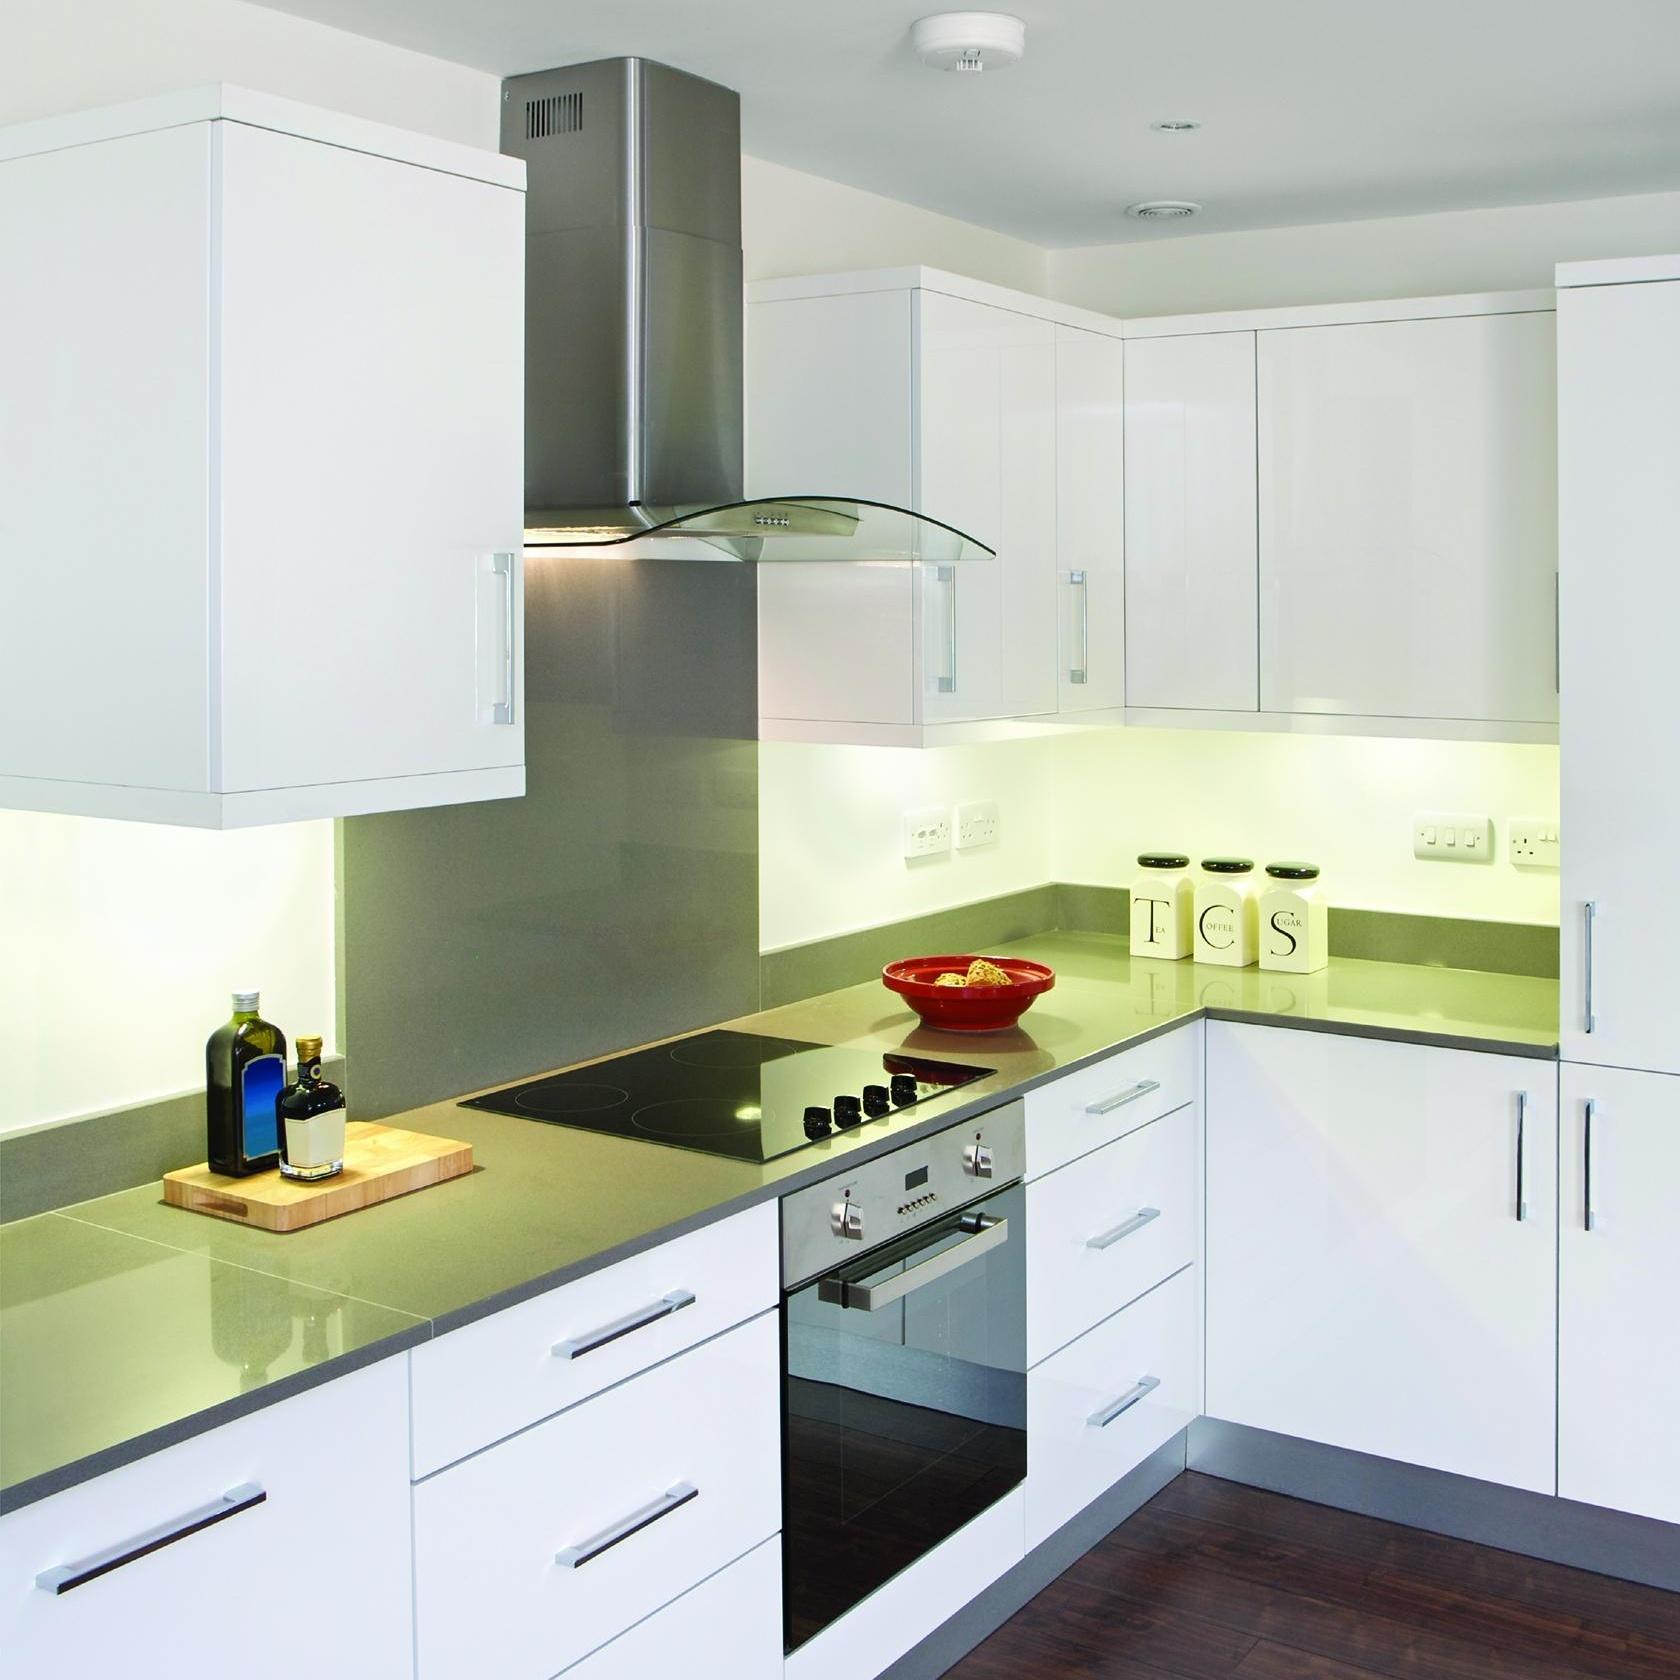 Kitchen Lighting Guide